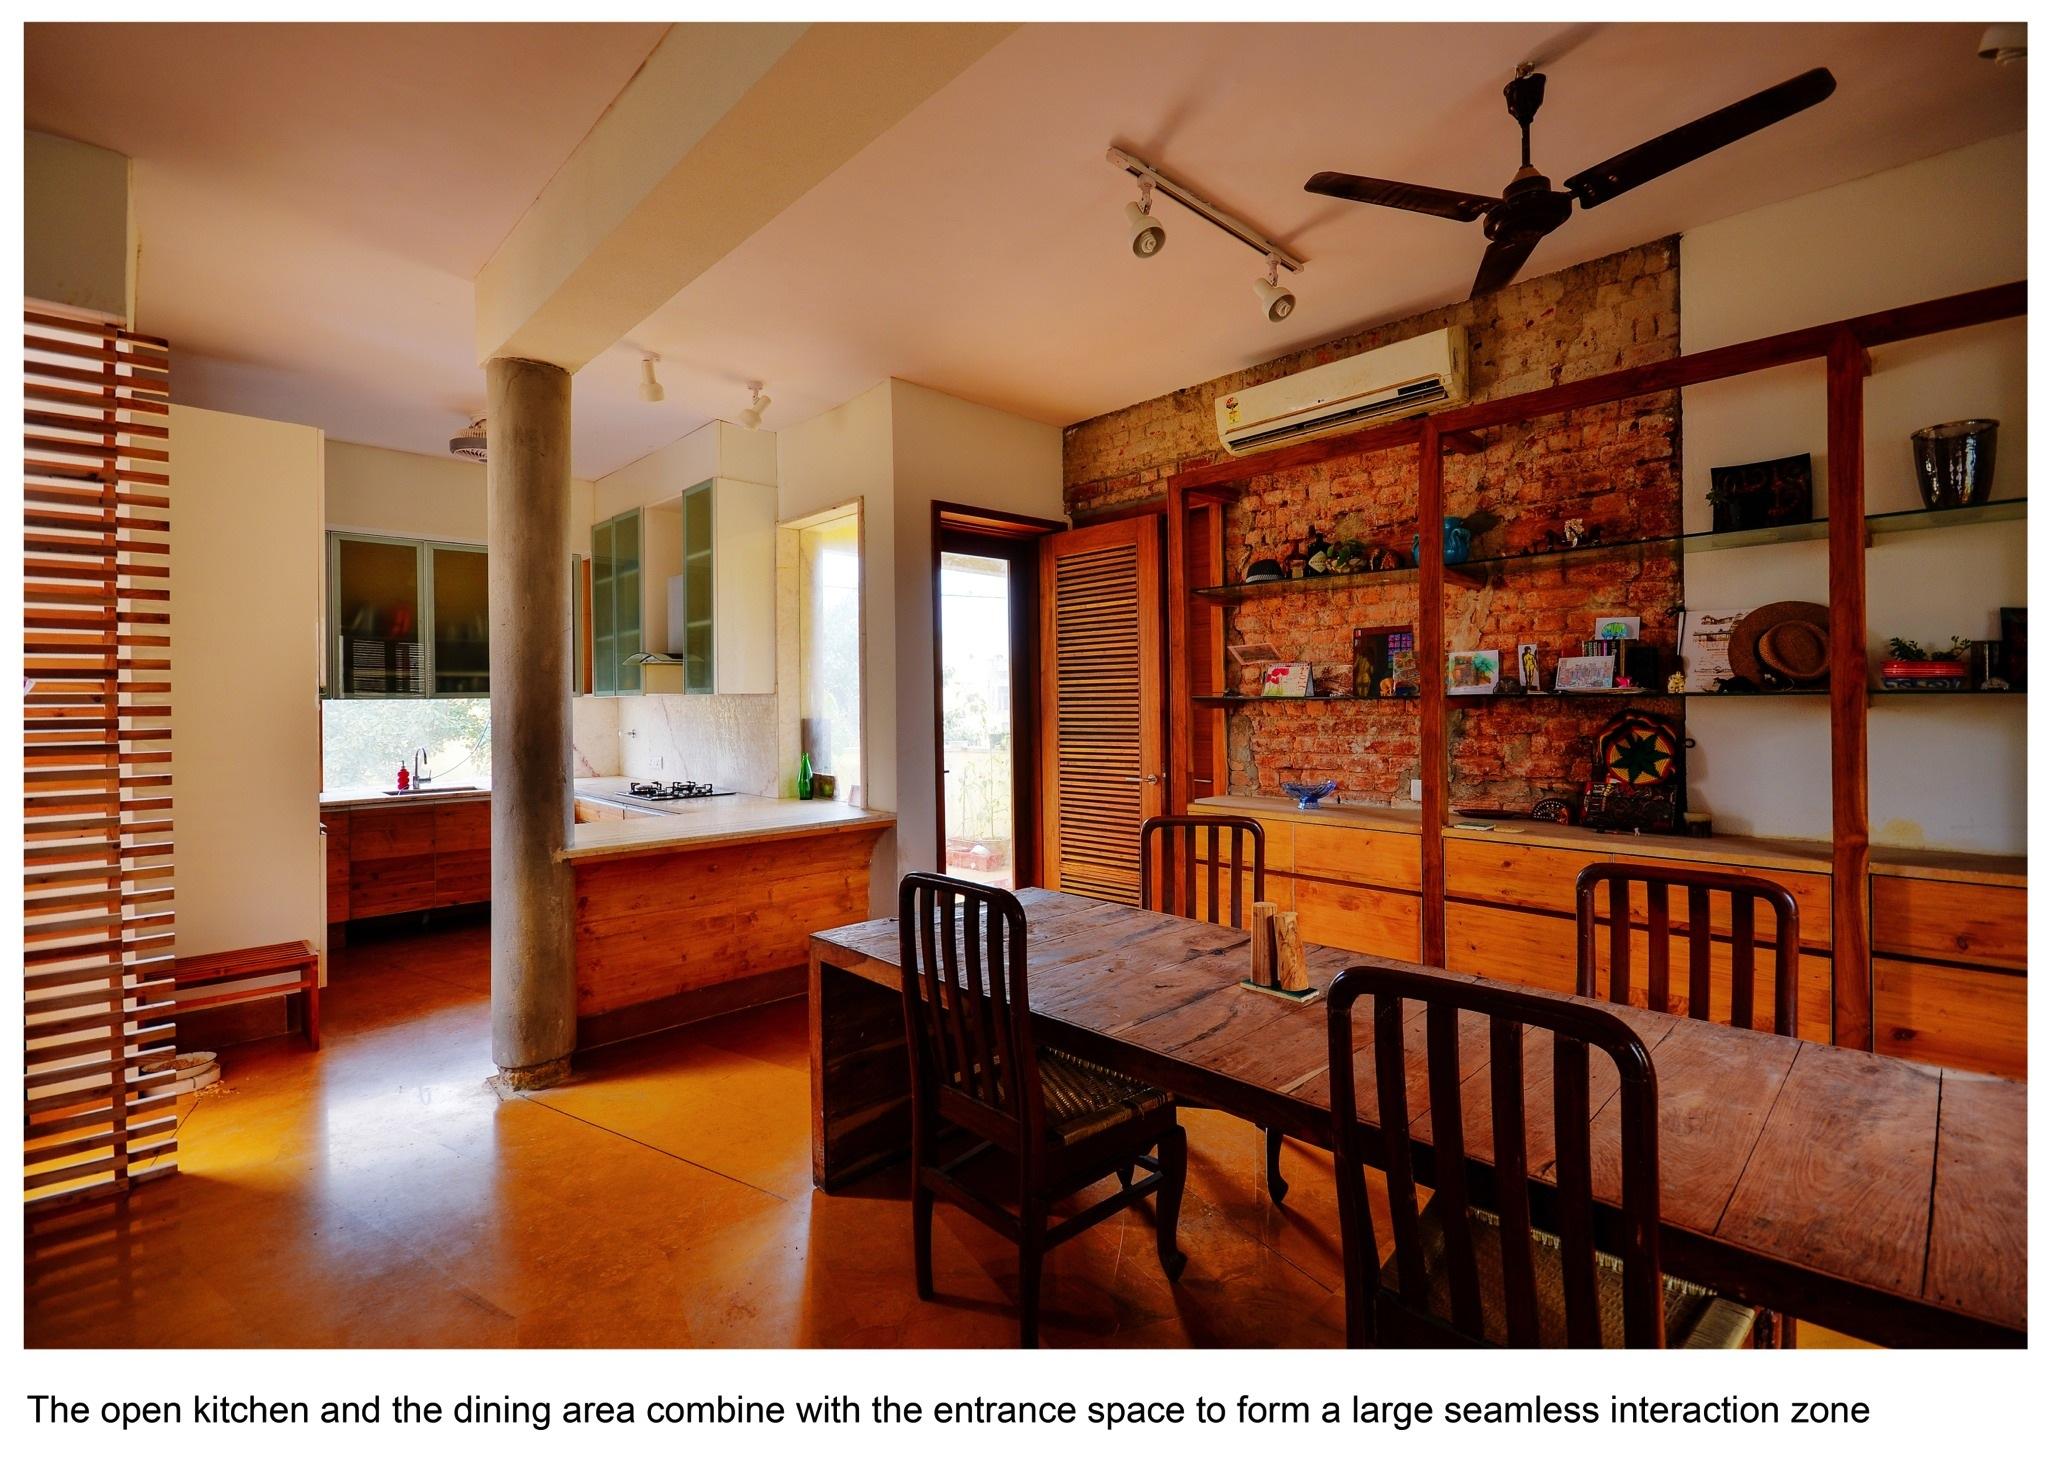 archiopteryx-design-flat-renovation-delhi